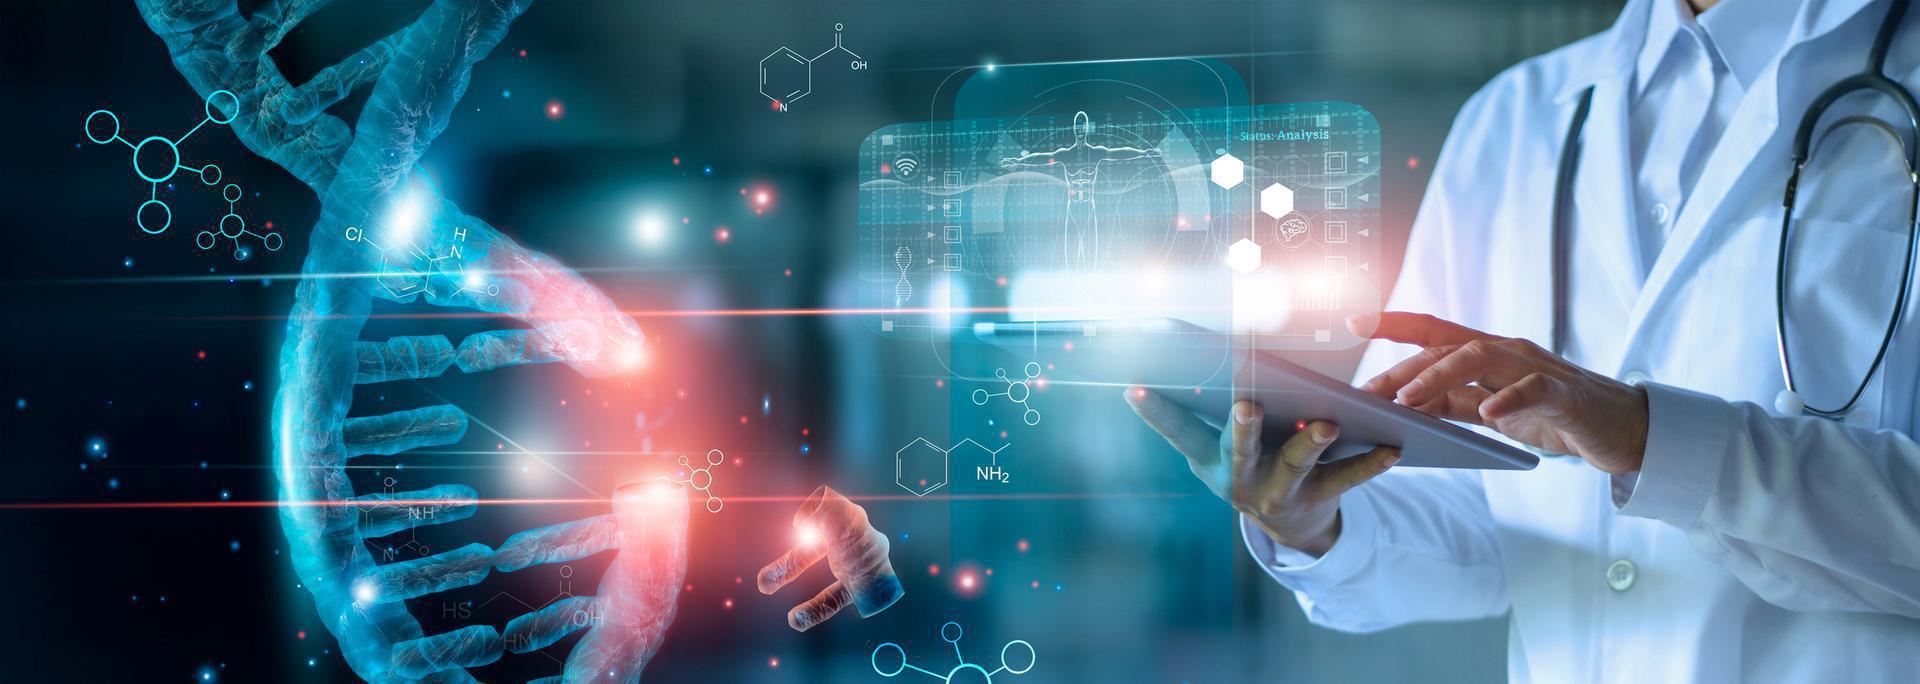 Drug Testing and DNA Testing - Nixa MO - featured